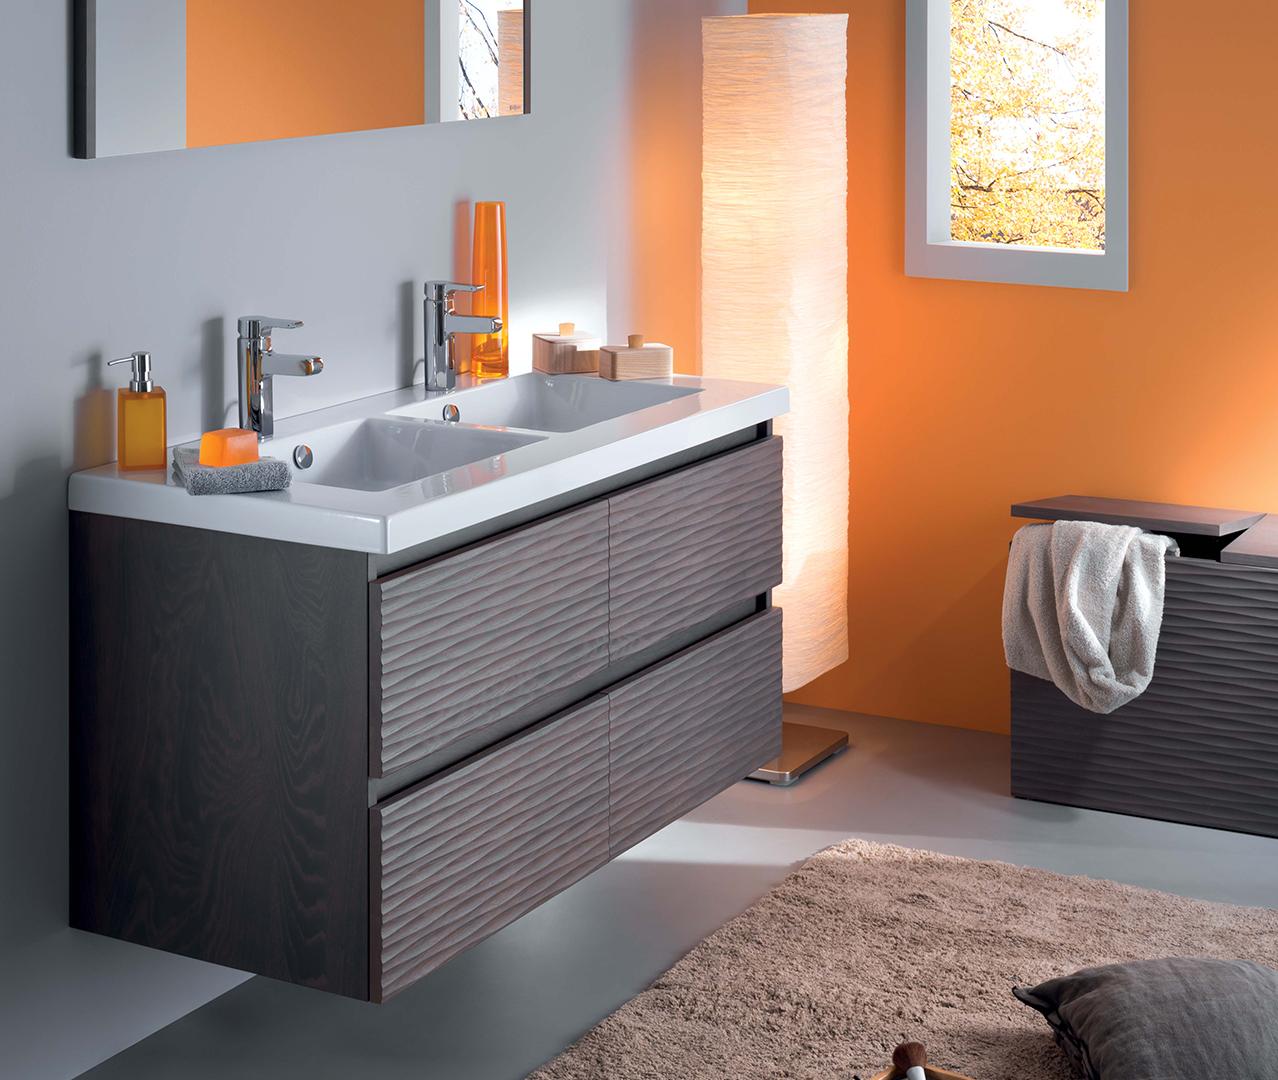 Gamme lignum meuble salle de bain bois sanijura for Salle bain orange